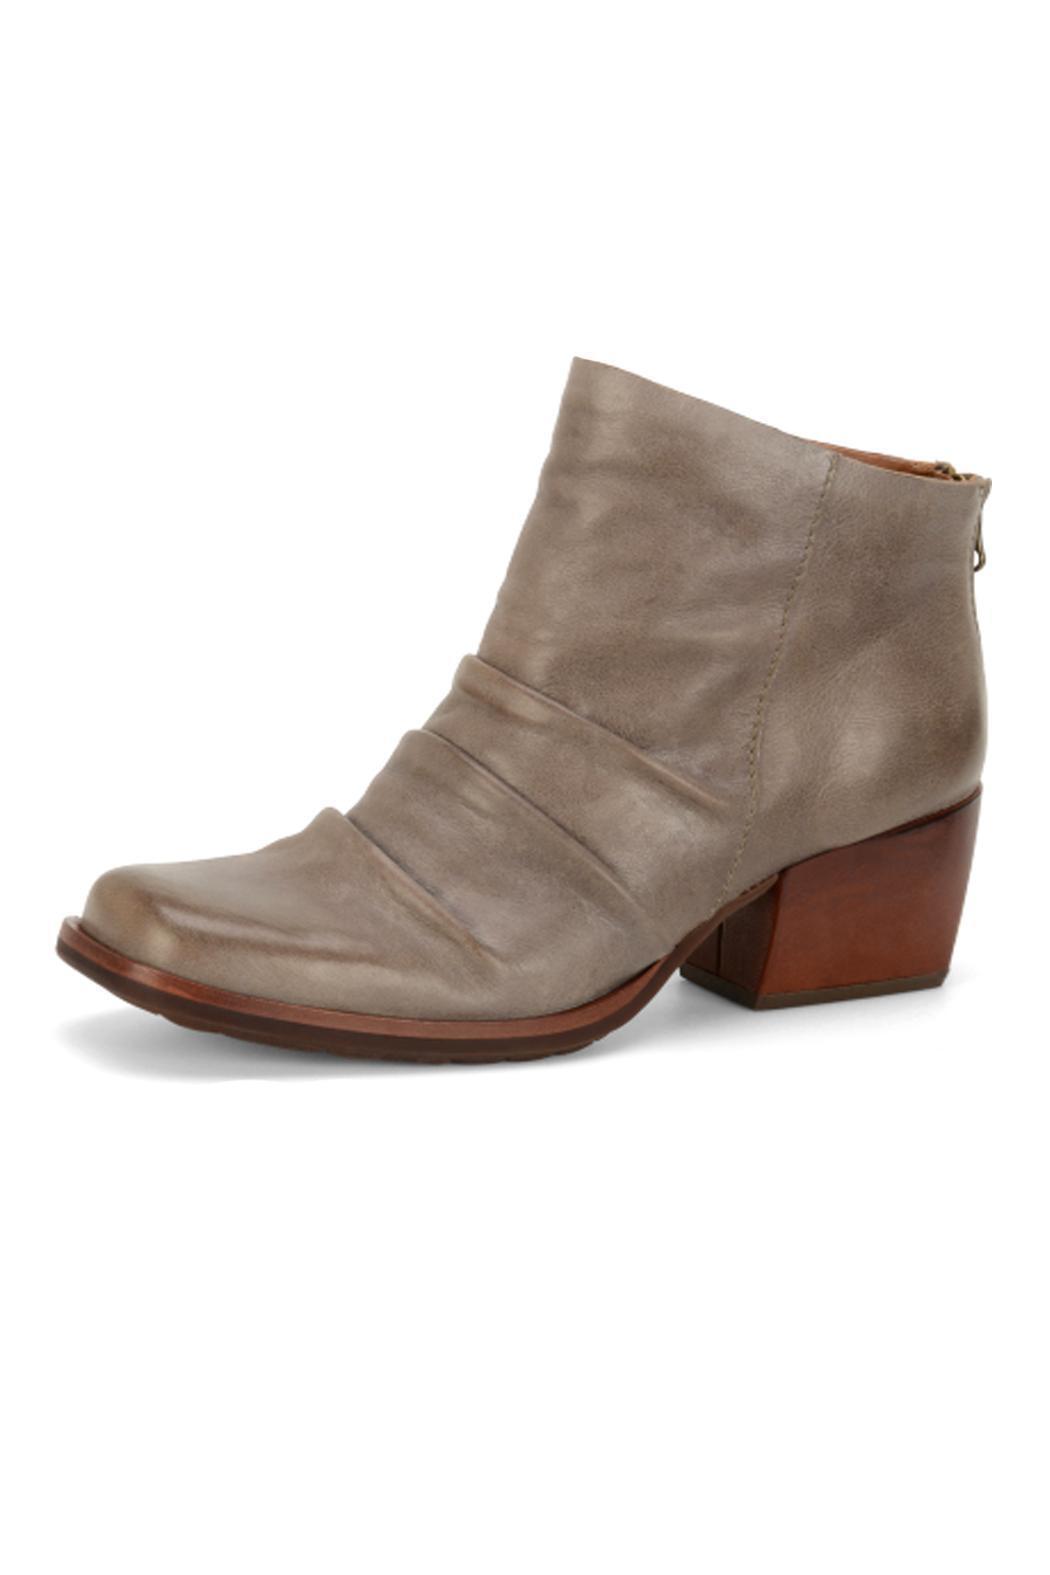 NEW Kork-Ease 'Kissel' démarrage, gris Leather, femmes Taille 5,  200